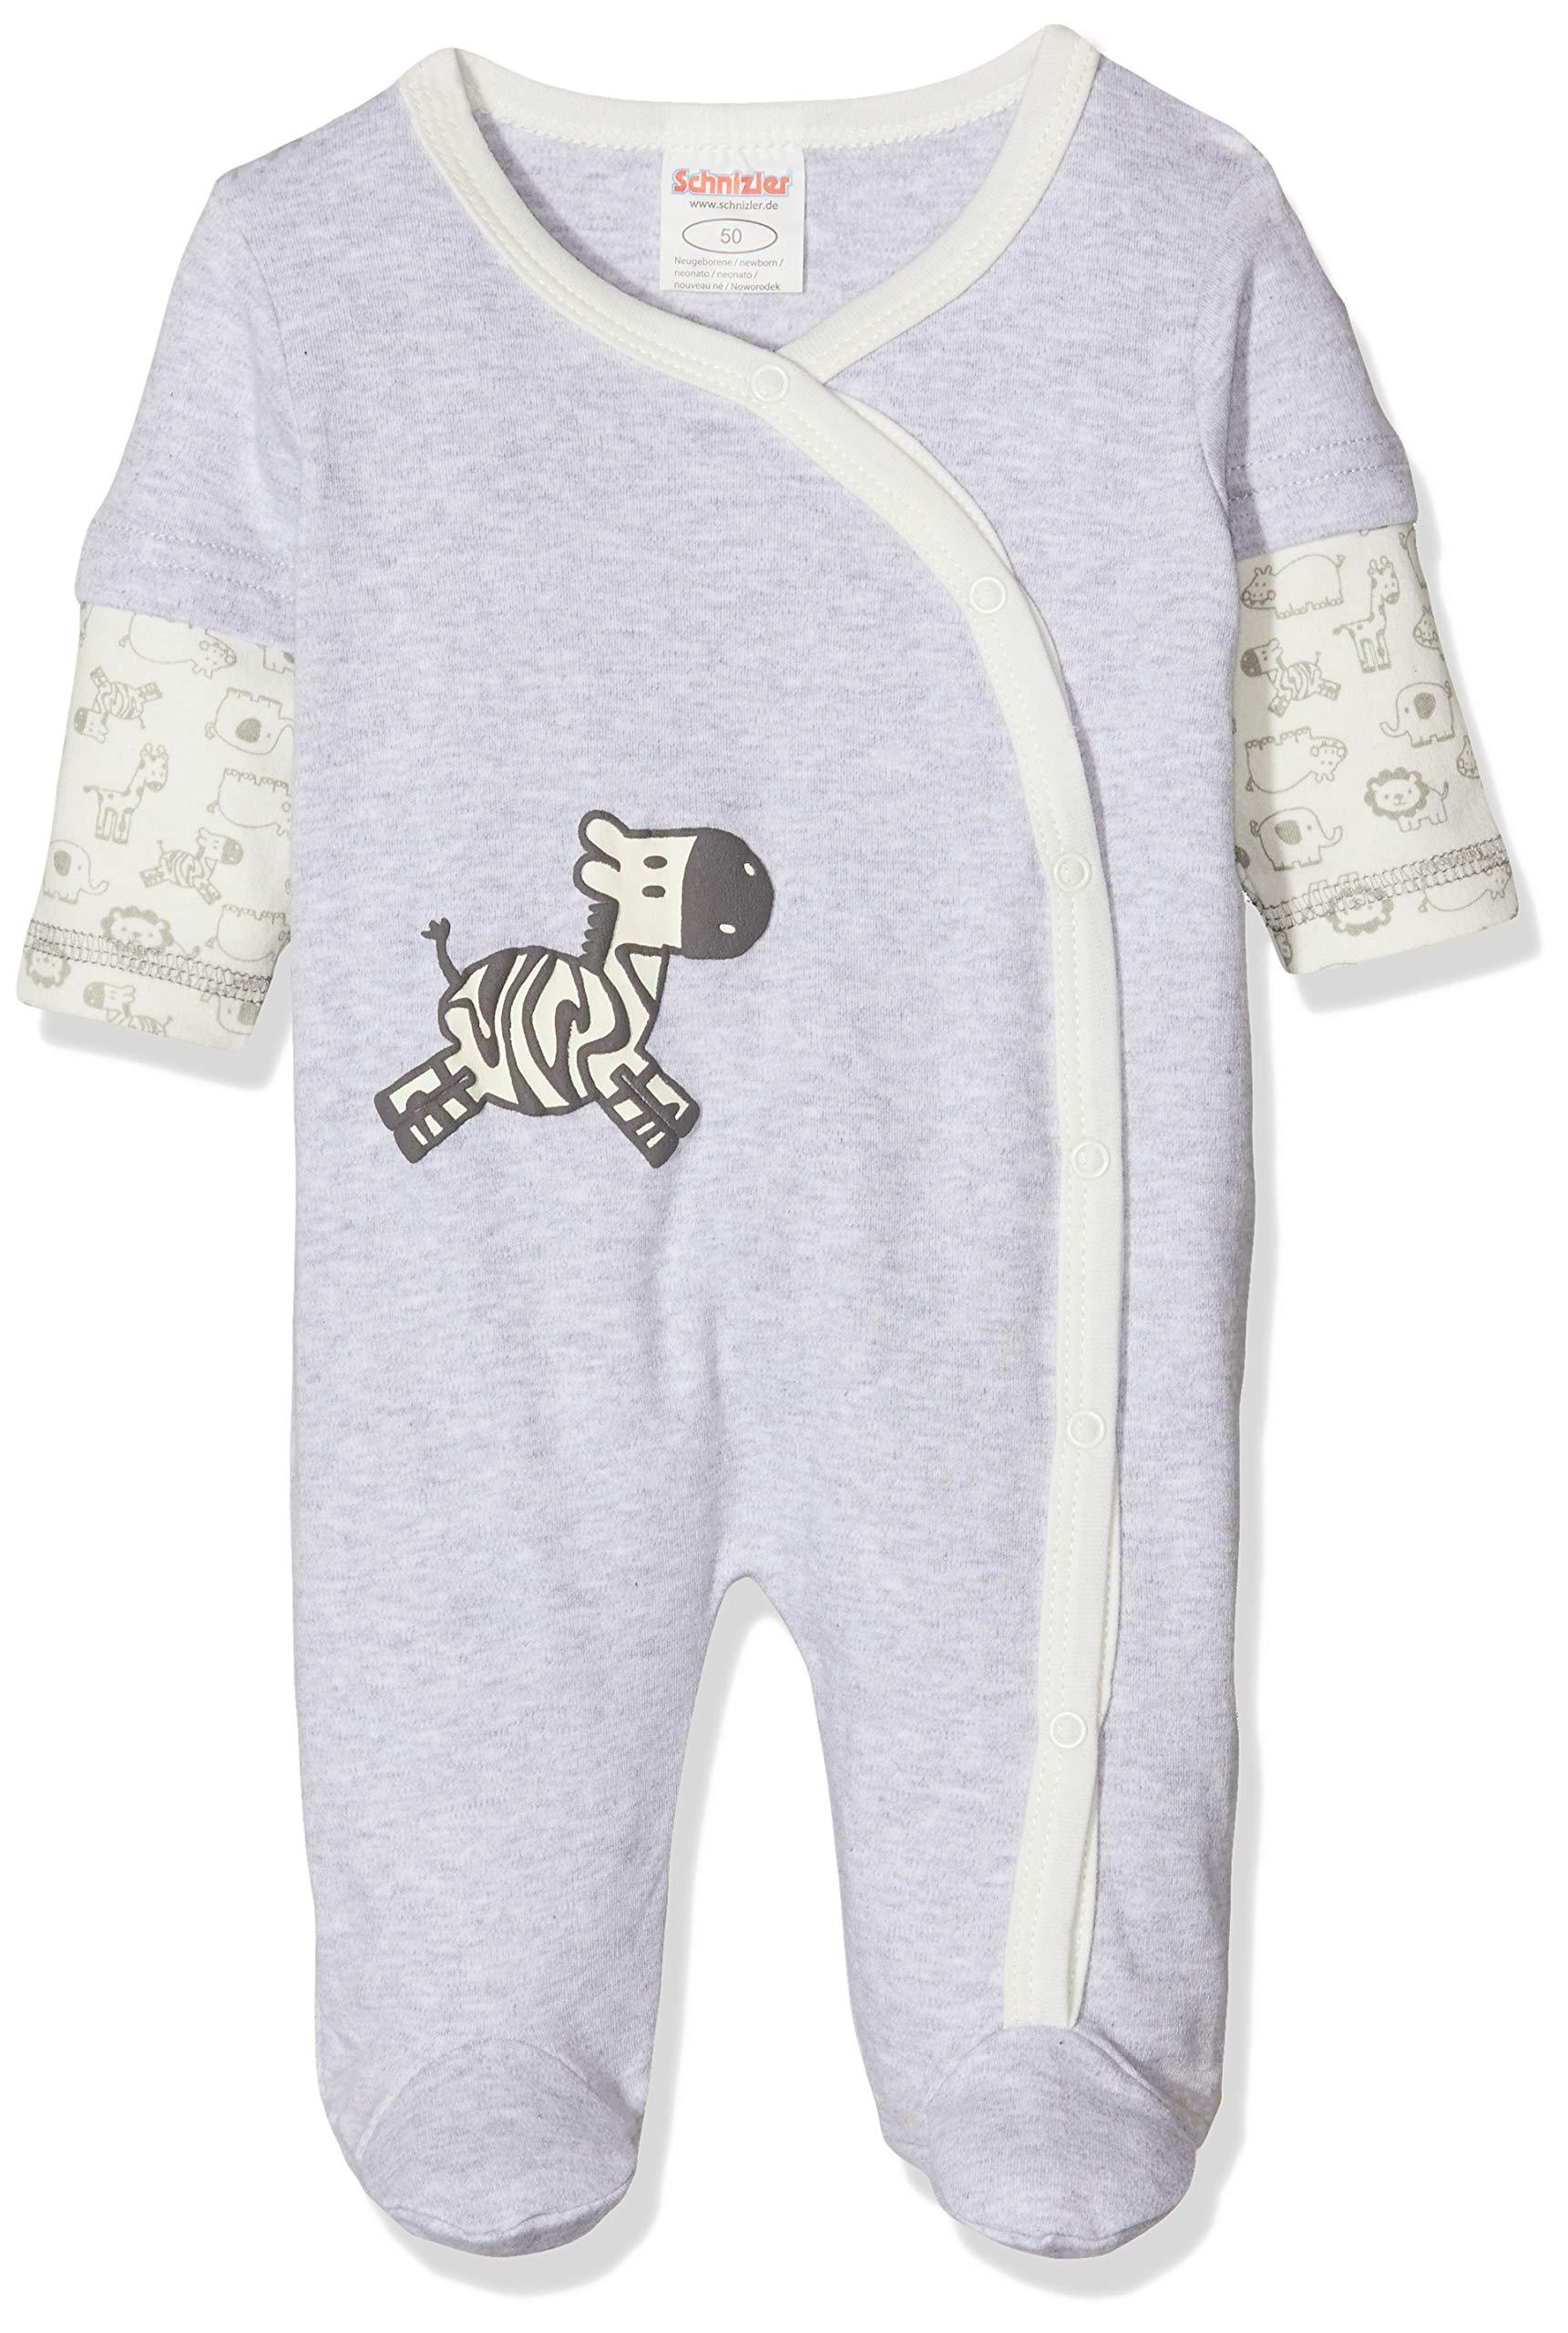 Schnizler Schlafoverall Interlock Zebra Pelele para Dormir Unisex bebé 1